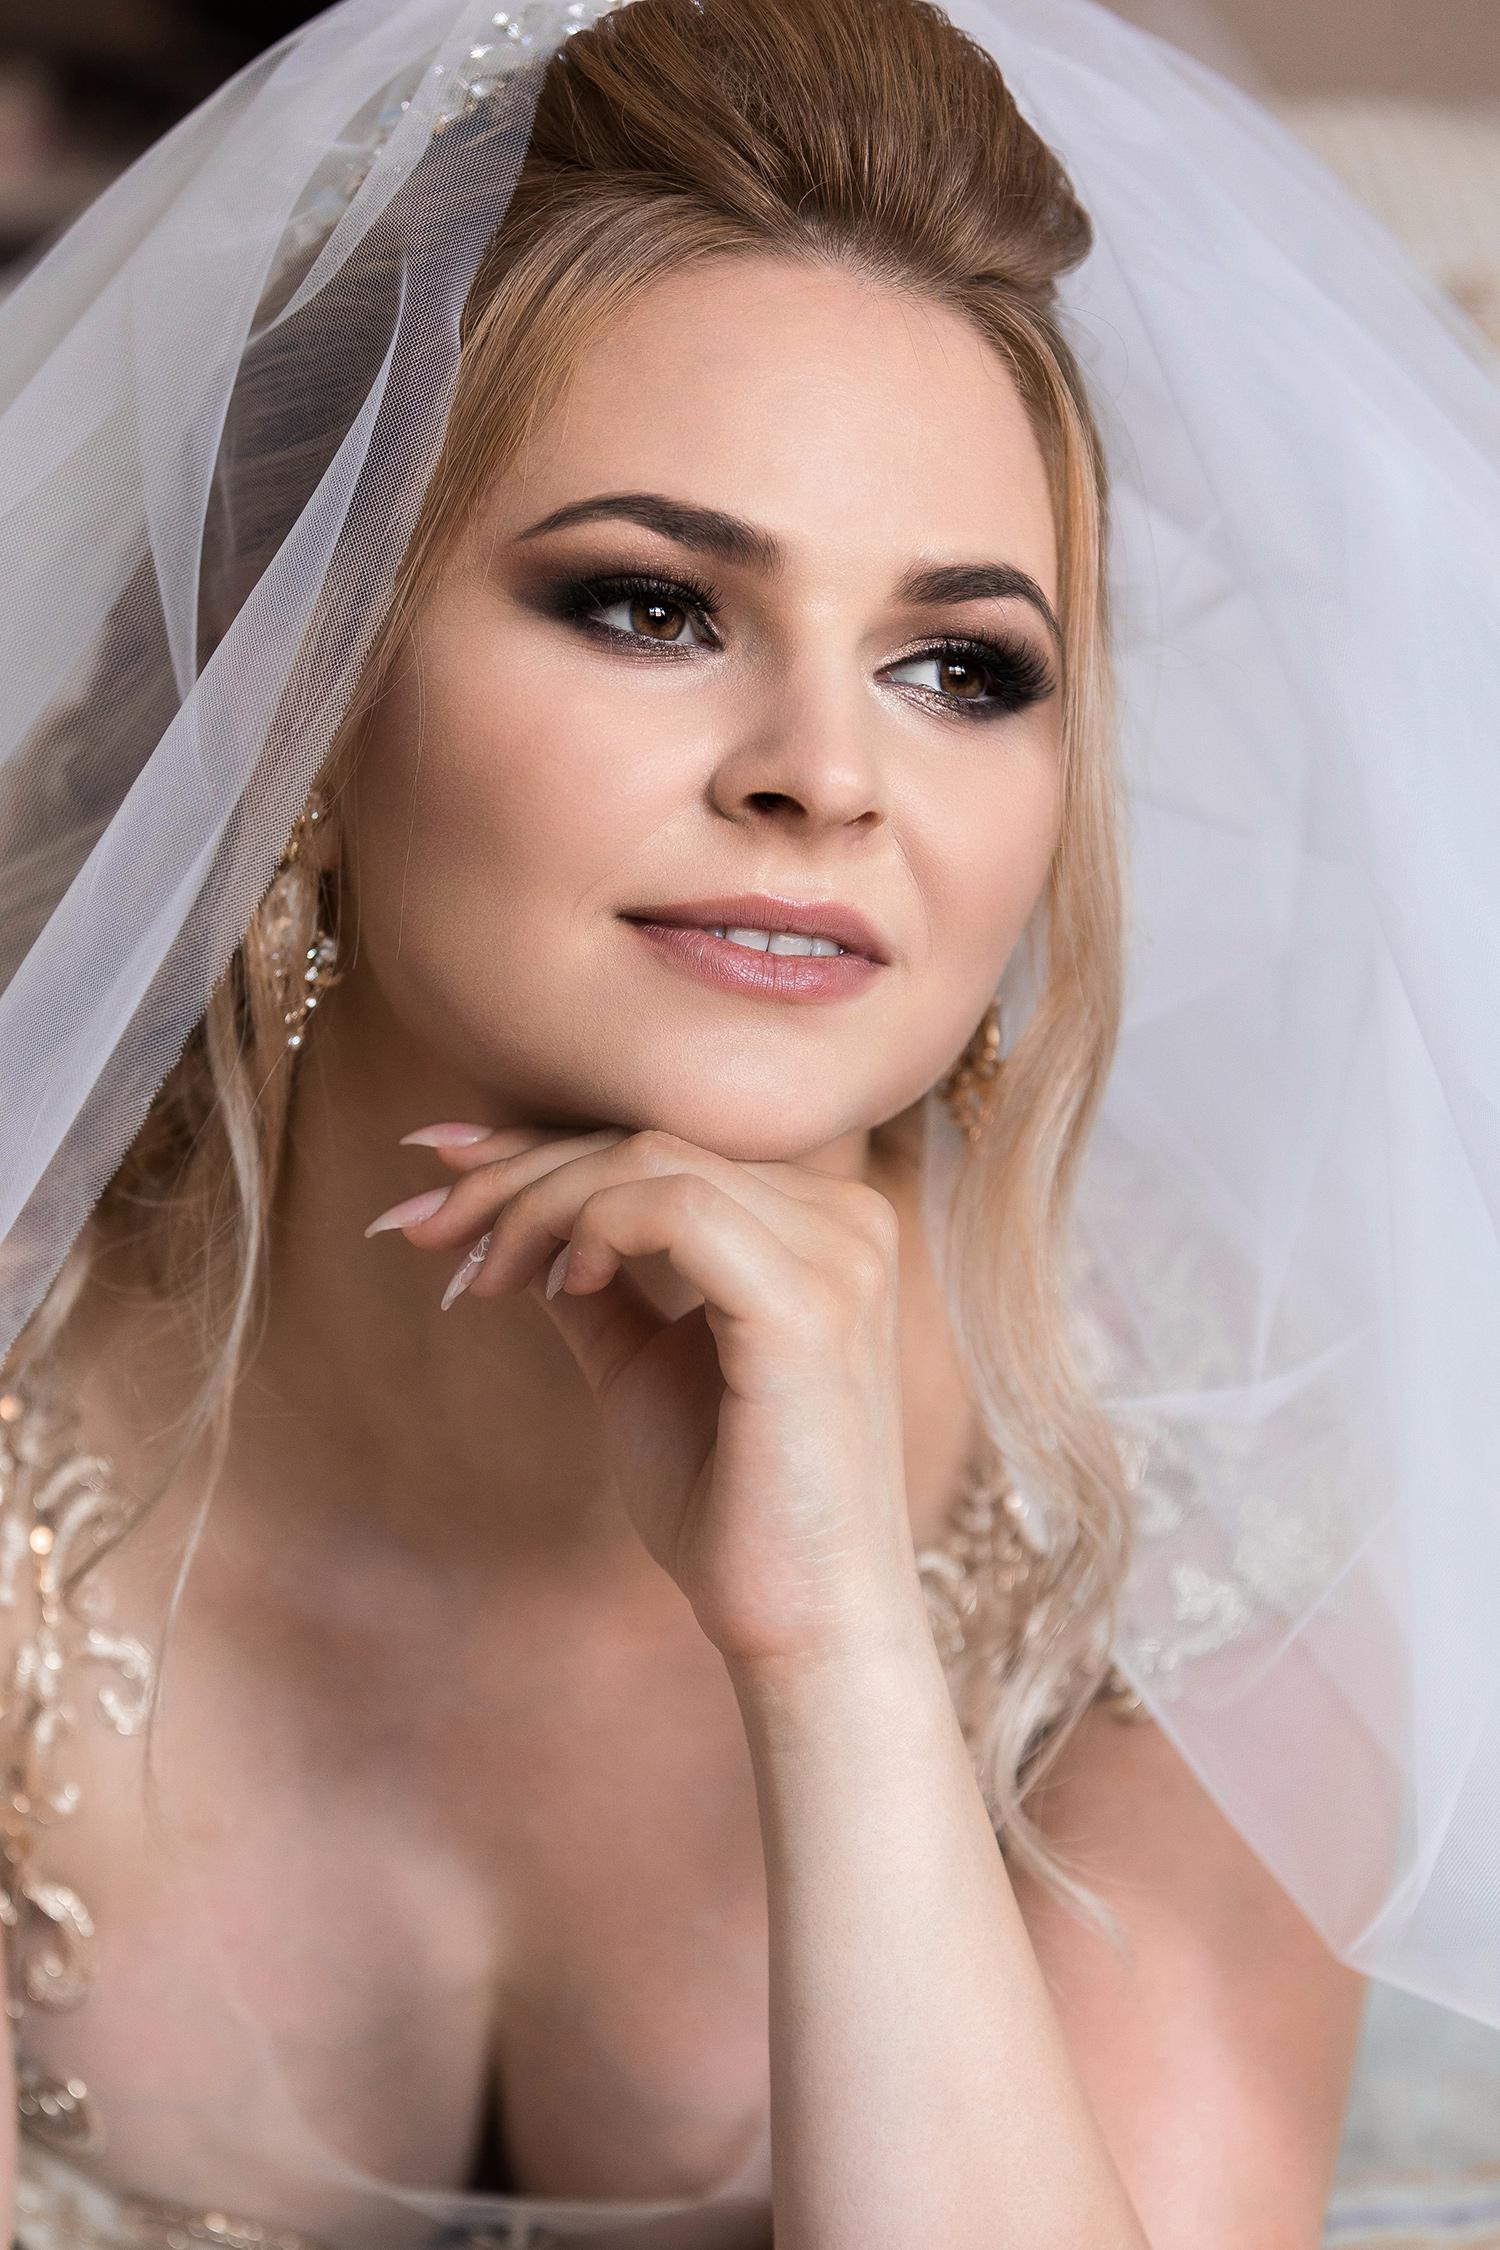 fotograf nunta iasi simona cosmin 05 1.jpg?scale.width=687&scale